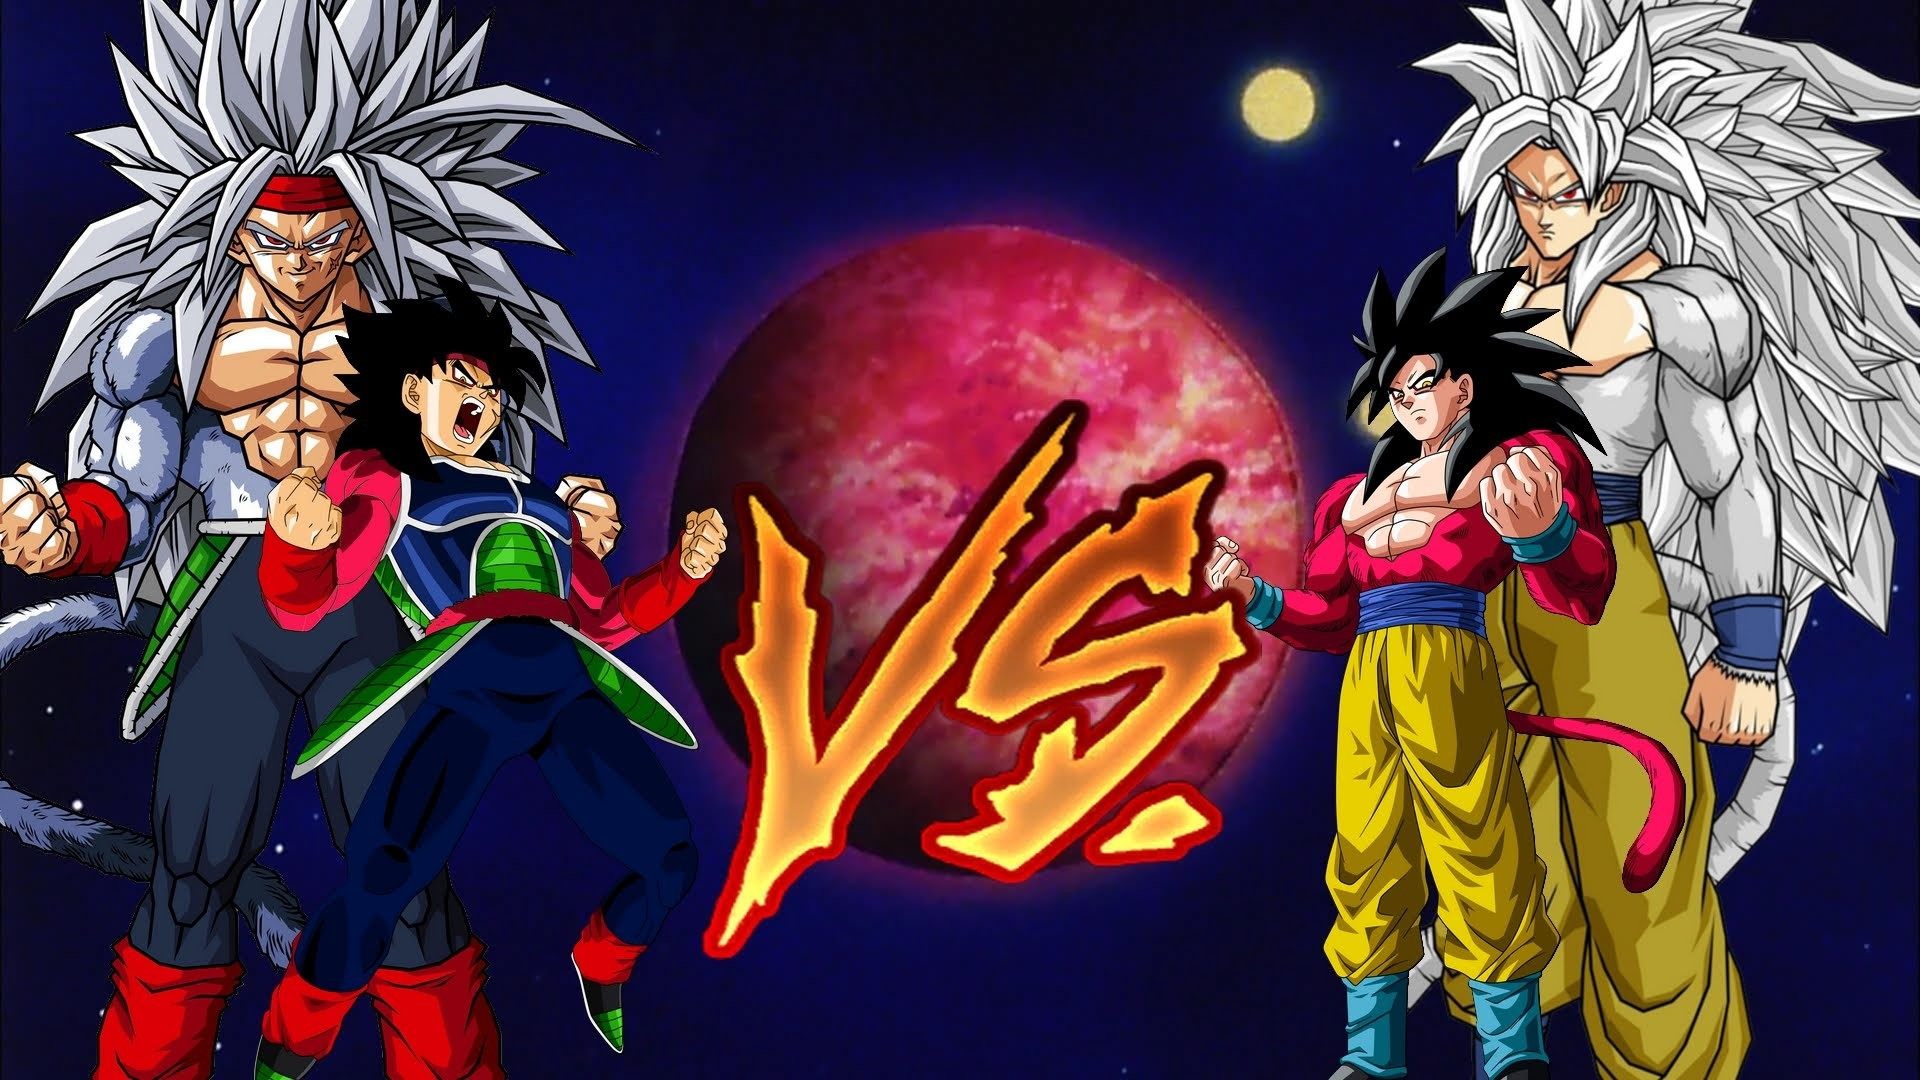 Goku Ssj4 Vs Goku Ssj3: Goku Ssj5 Wallpapers (48+ Images